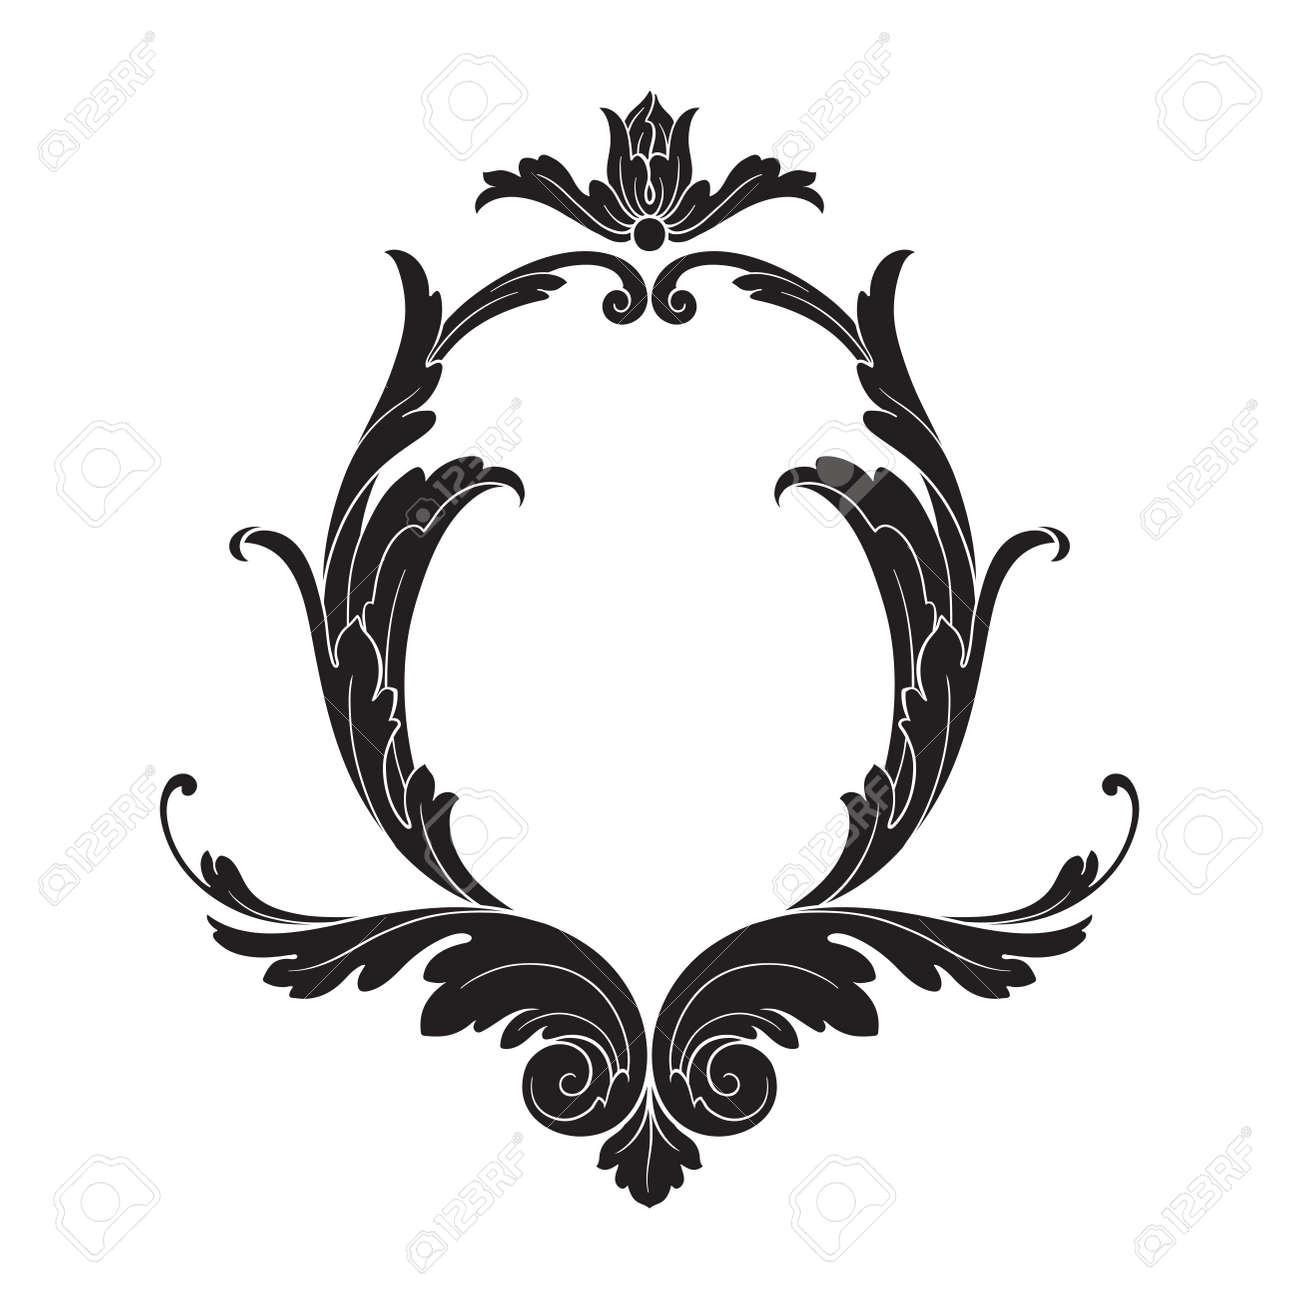 classical baroque vector of vintage element for design decorative rh 123rf com filigree factory shop codnor filigree vector corner